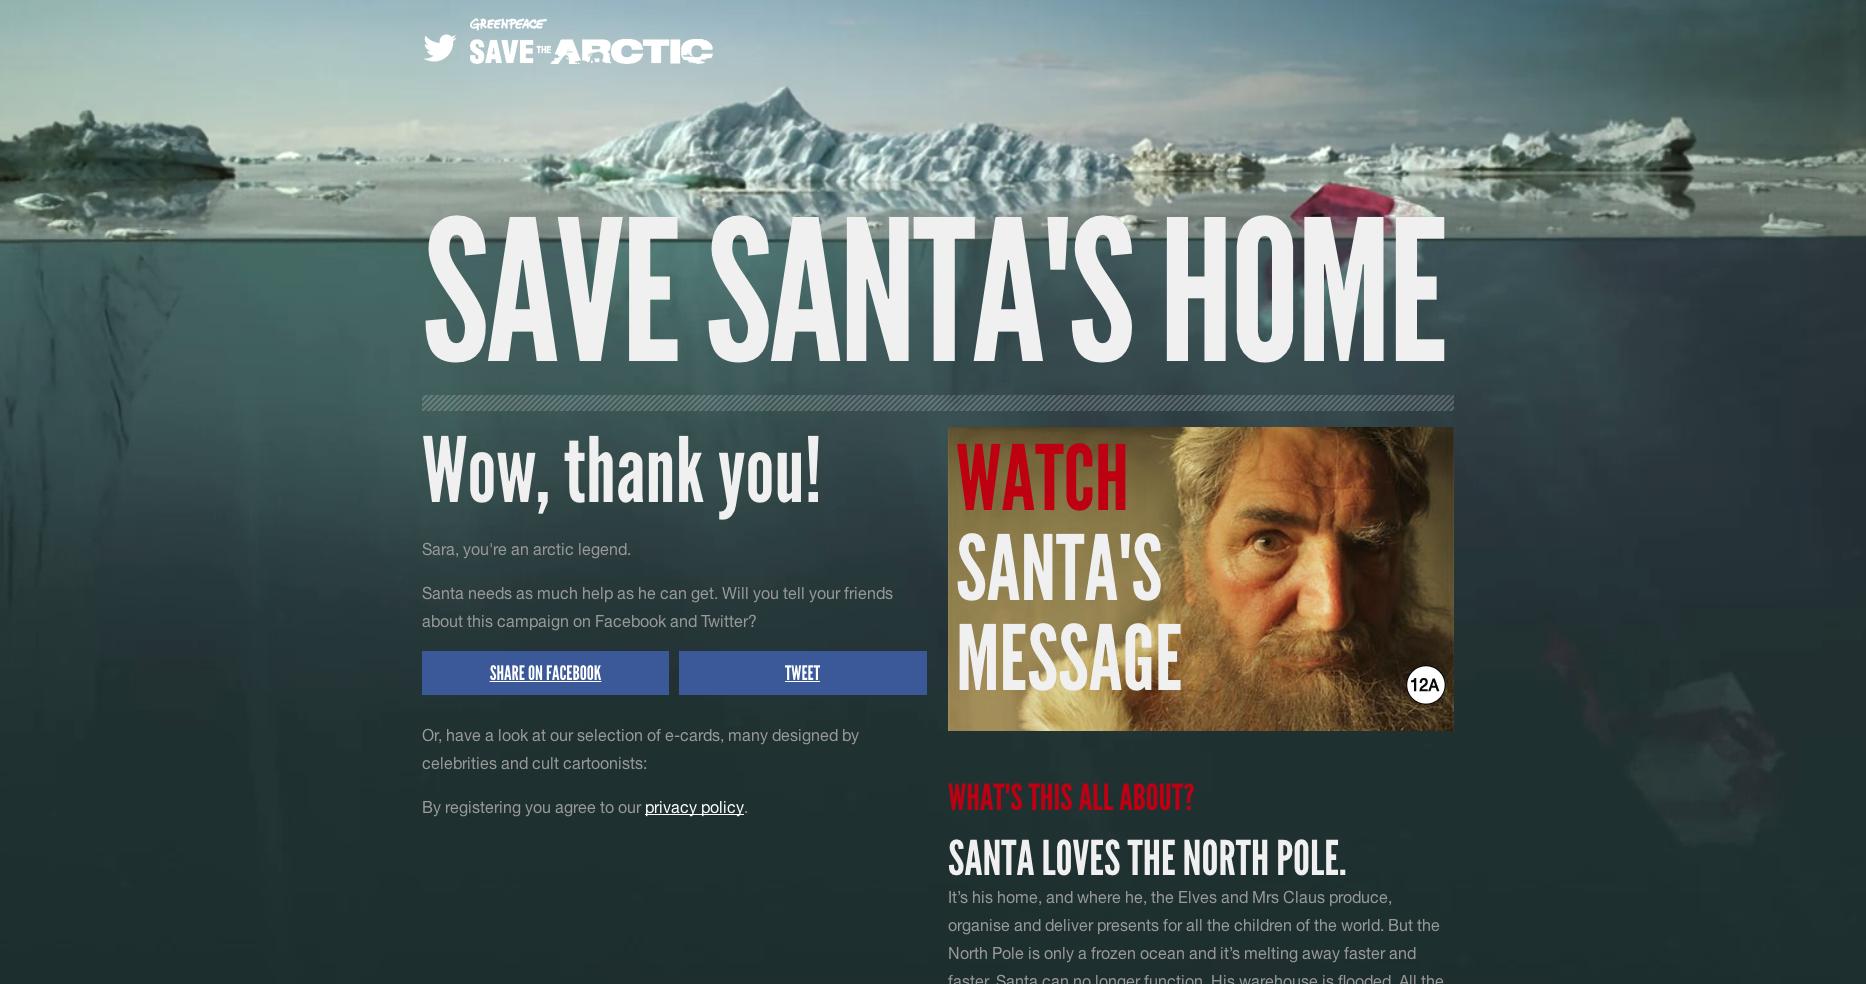 Greenpeace_Save santa's home